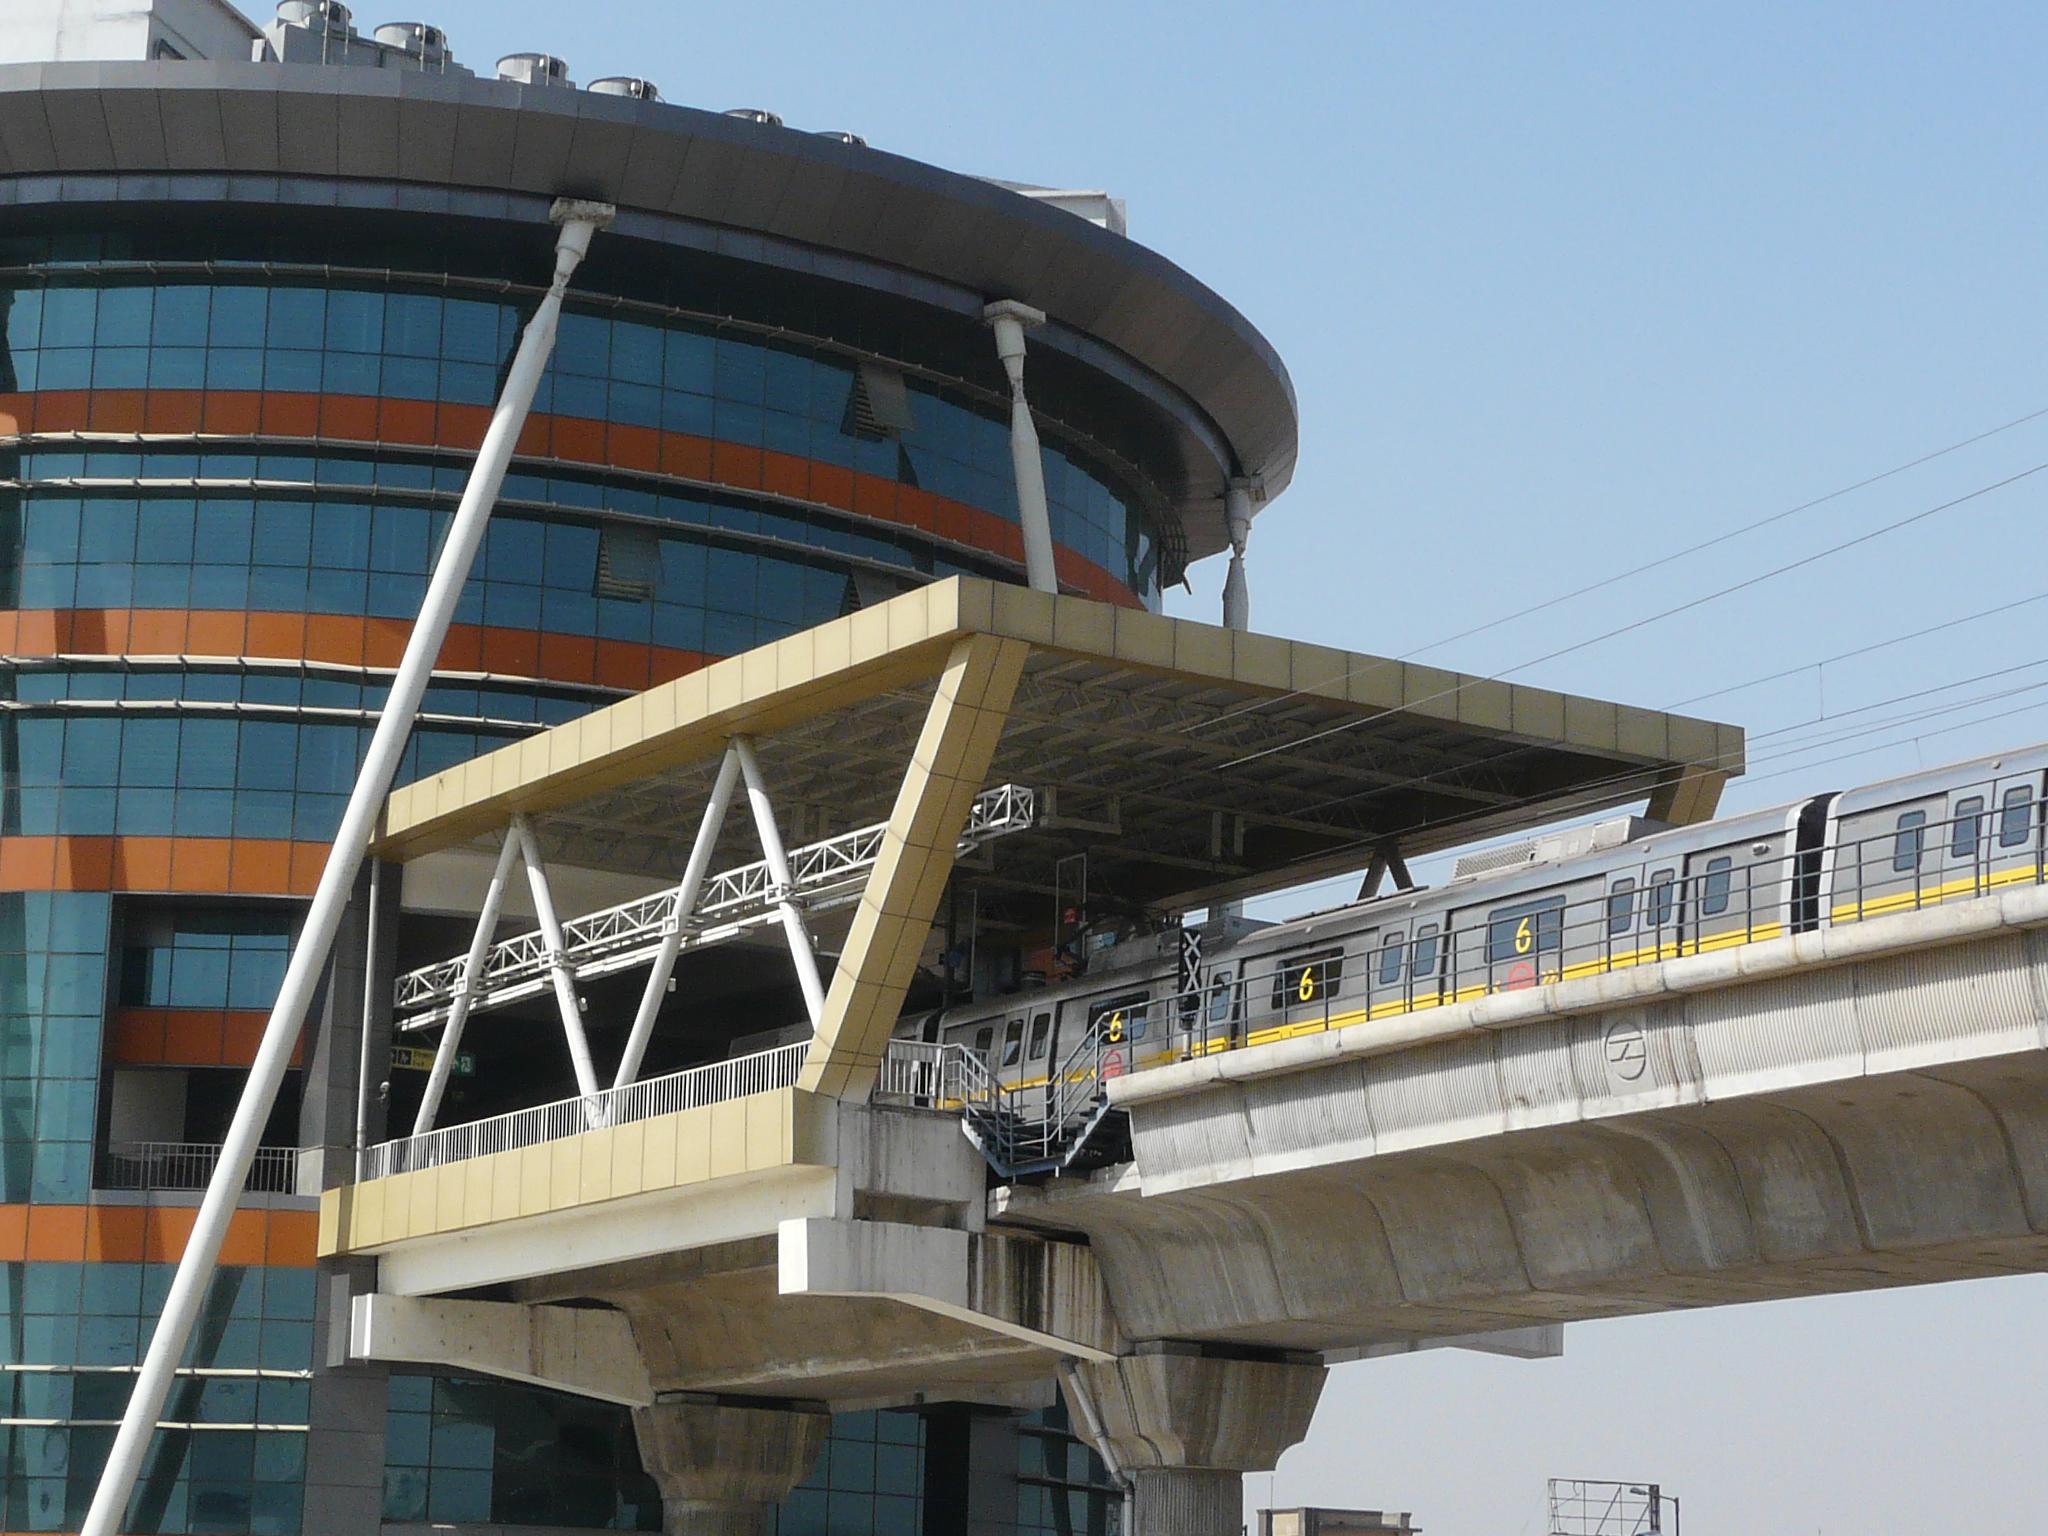 File:HUDA City Center (Delhi Metro).jpg - Wikimedia Commons